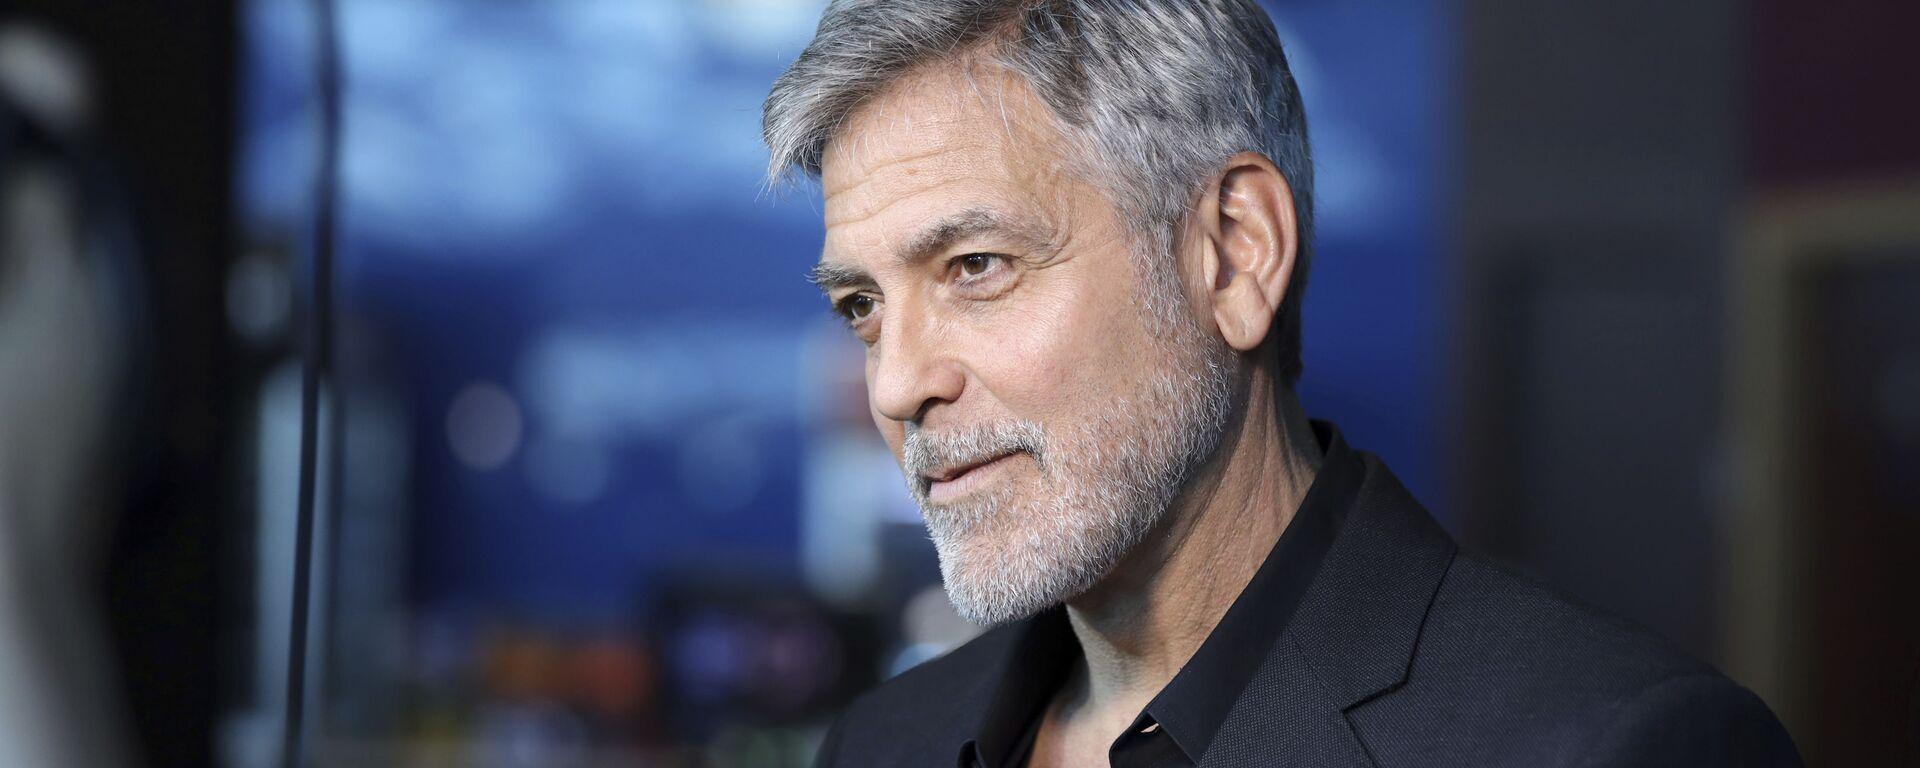 Herec George Clooney - Sputnik Česká republika, 1920, 17.12.2020